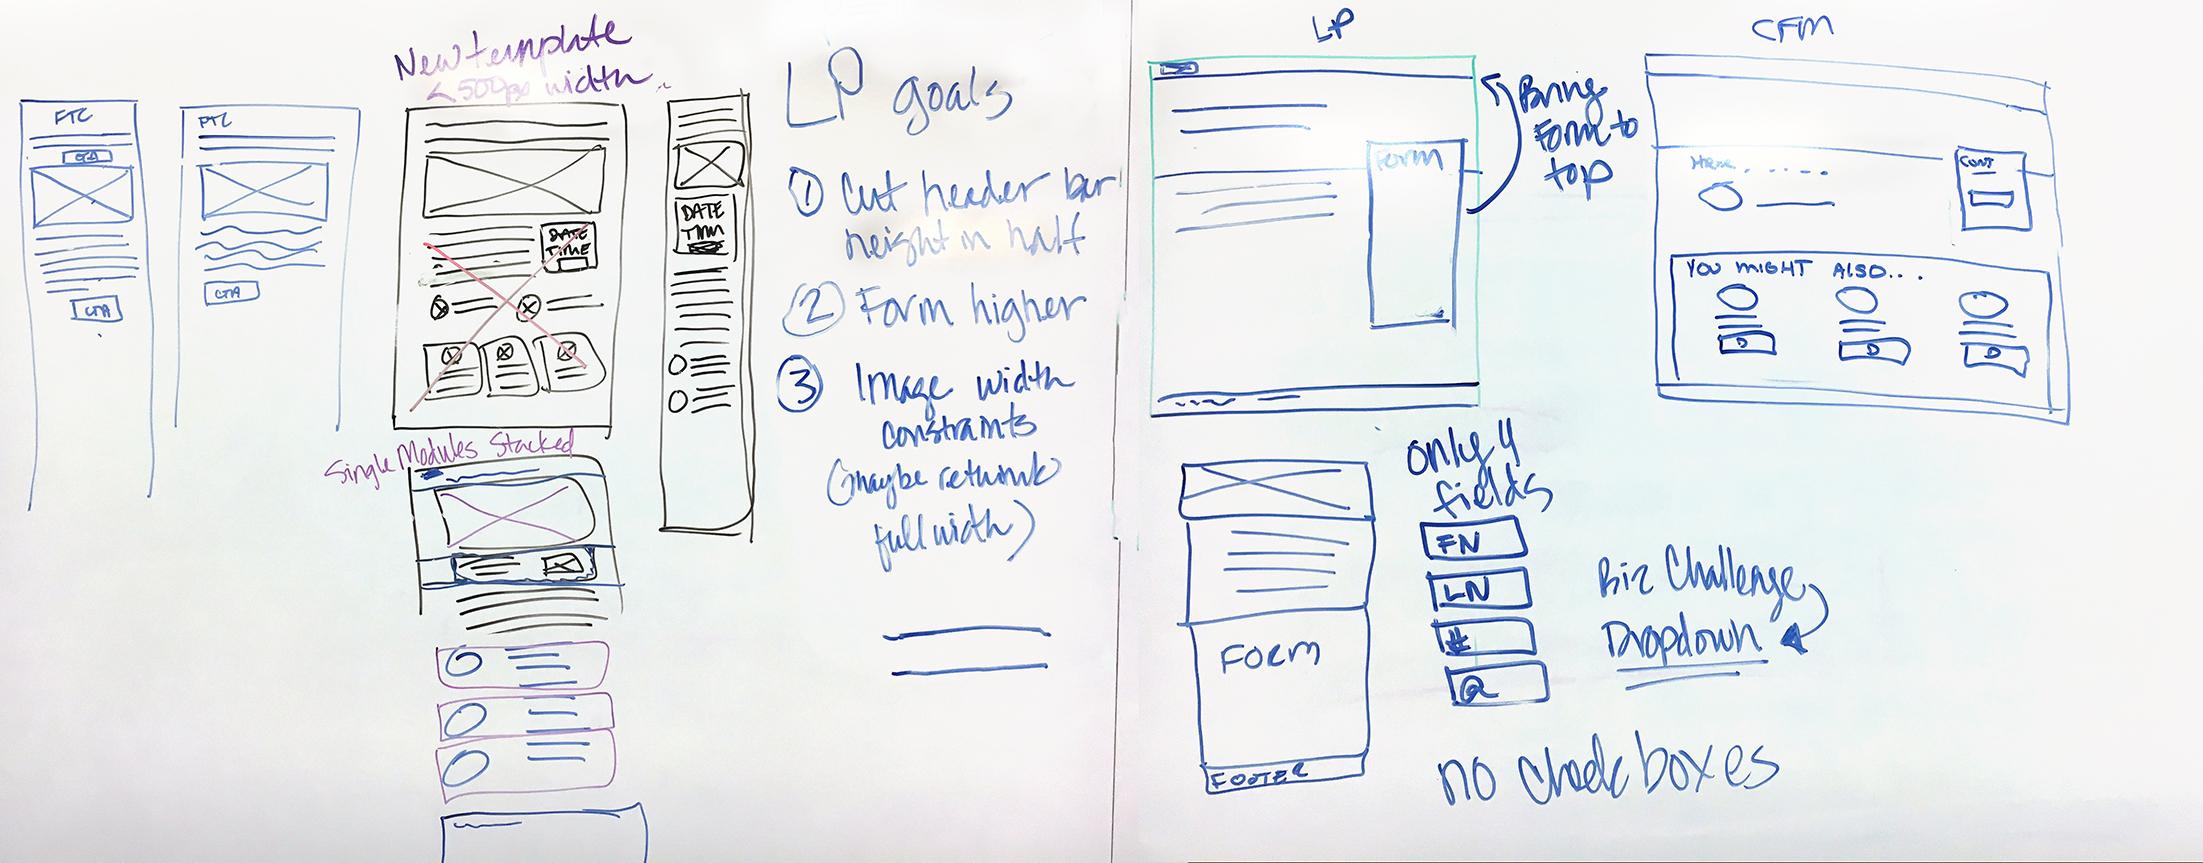 FTC-templates-whiteboard-wireframming@0,33x.jpg